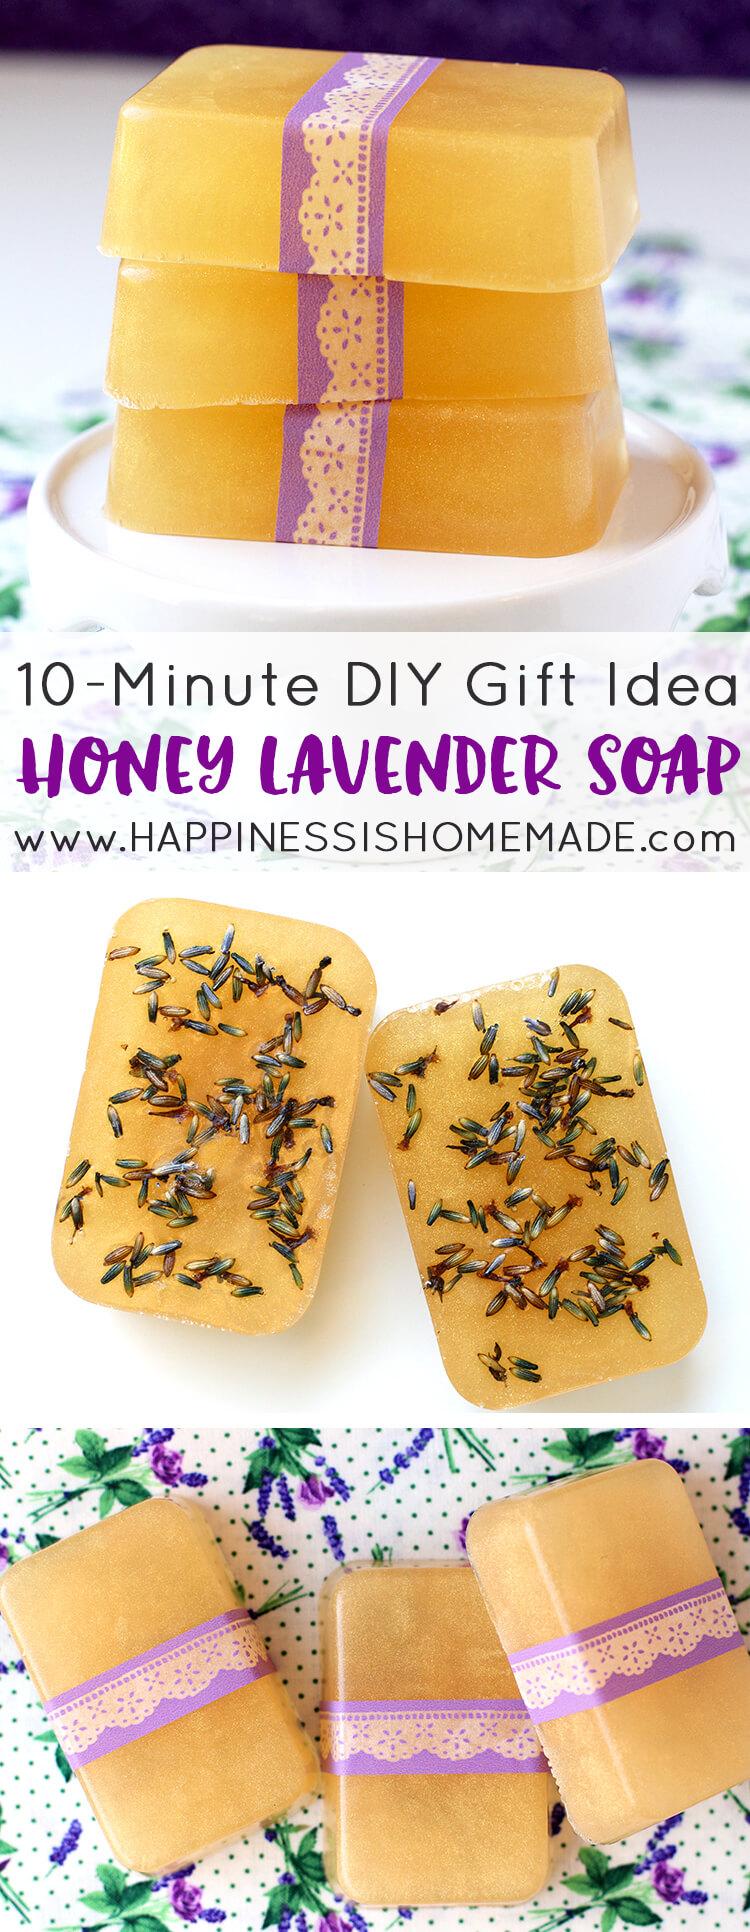 diy-honey-lavender-soap-10-minute-gift-idea